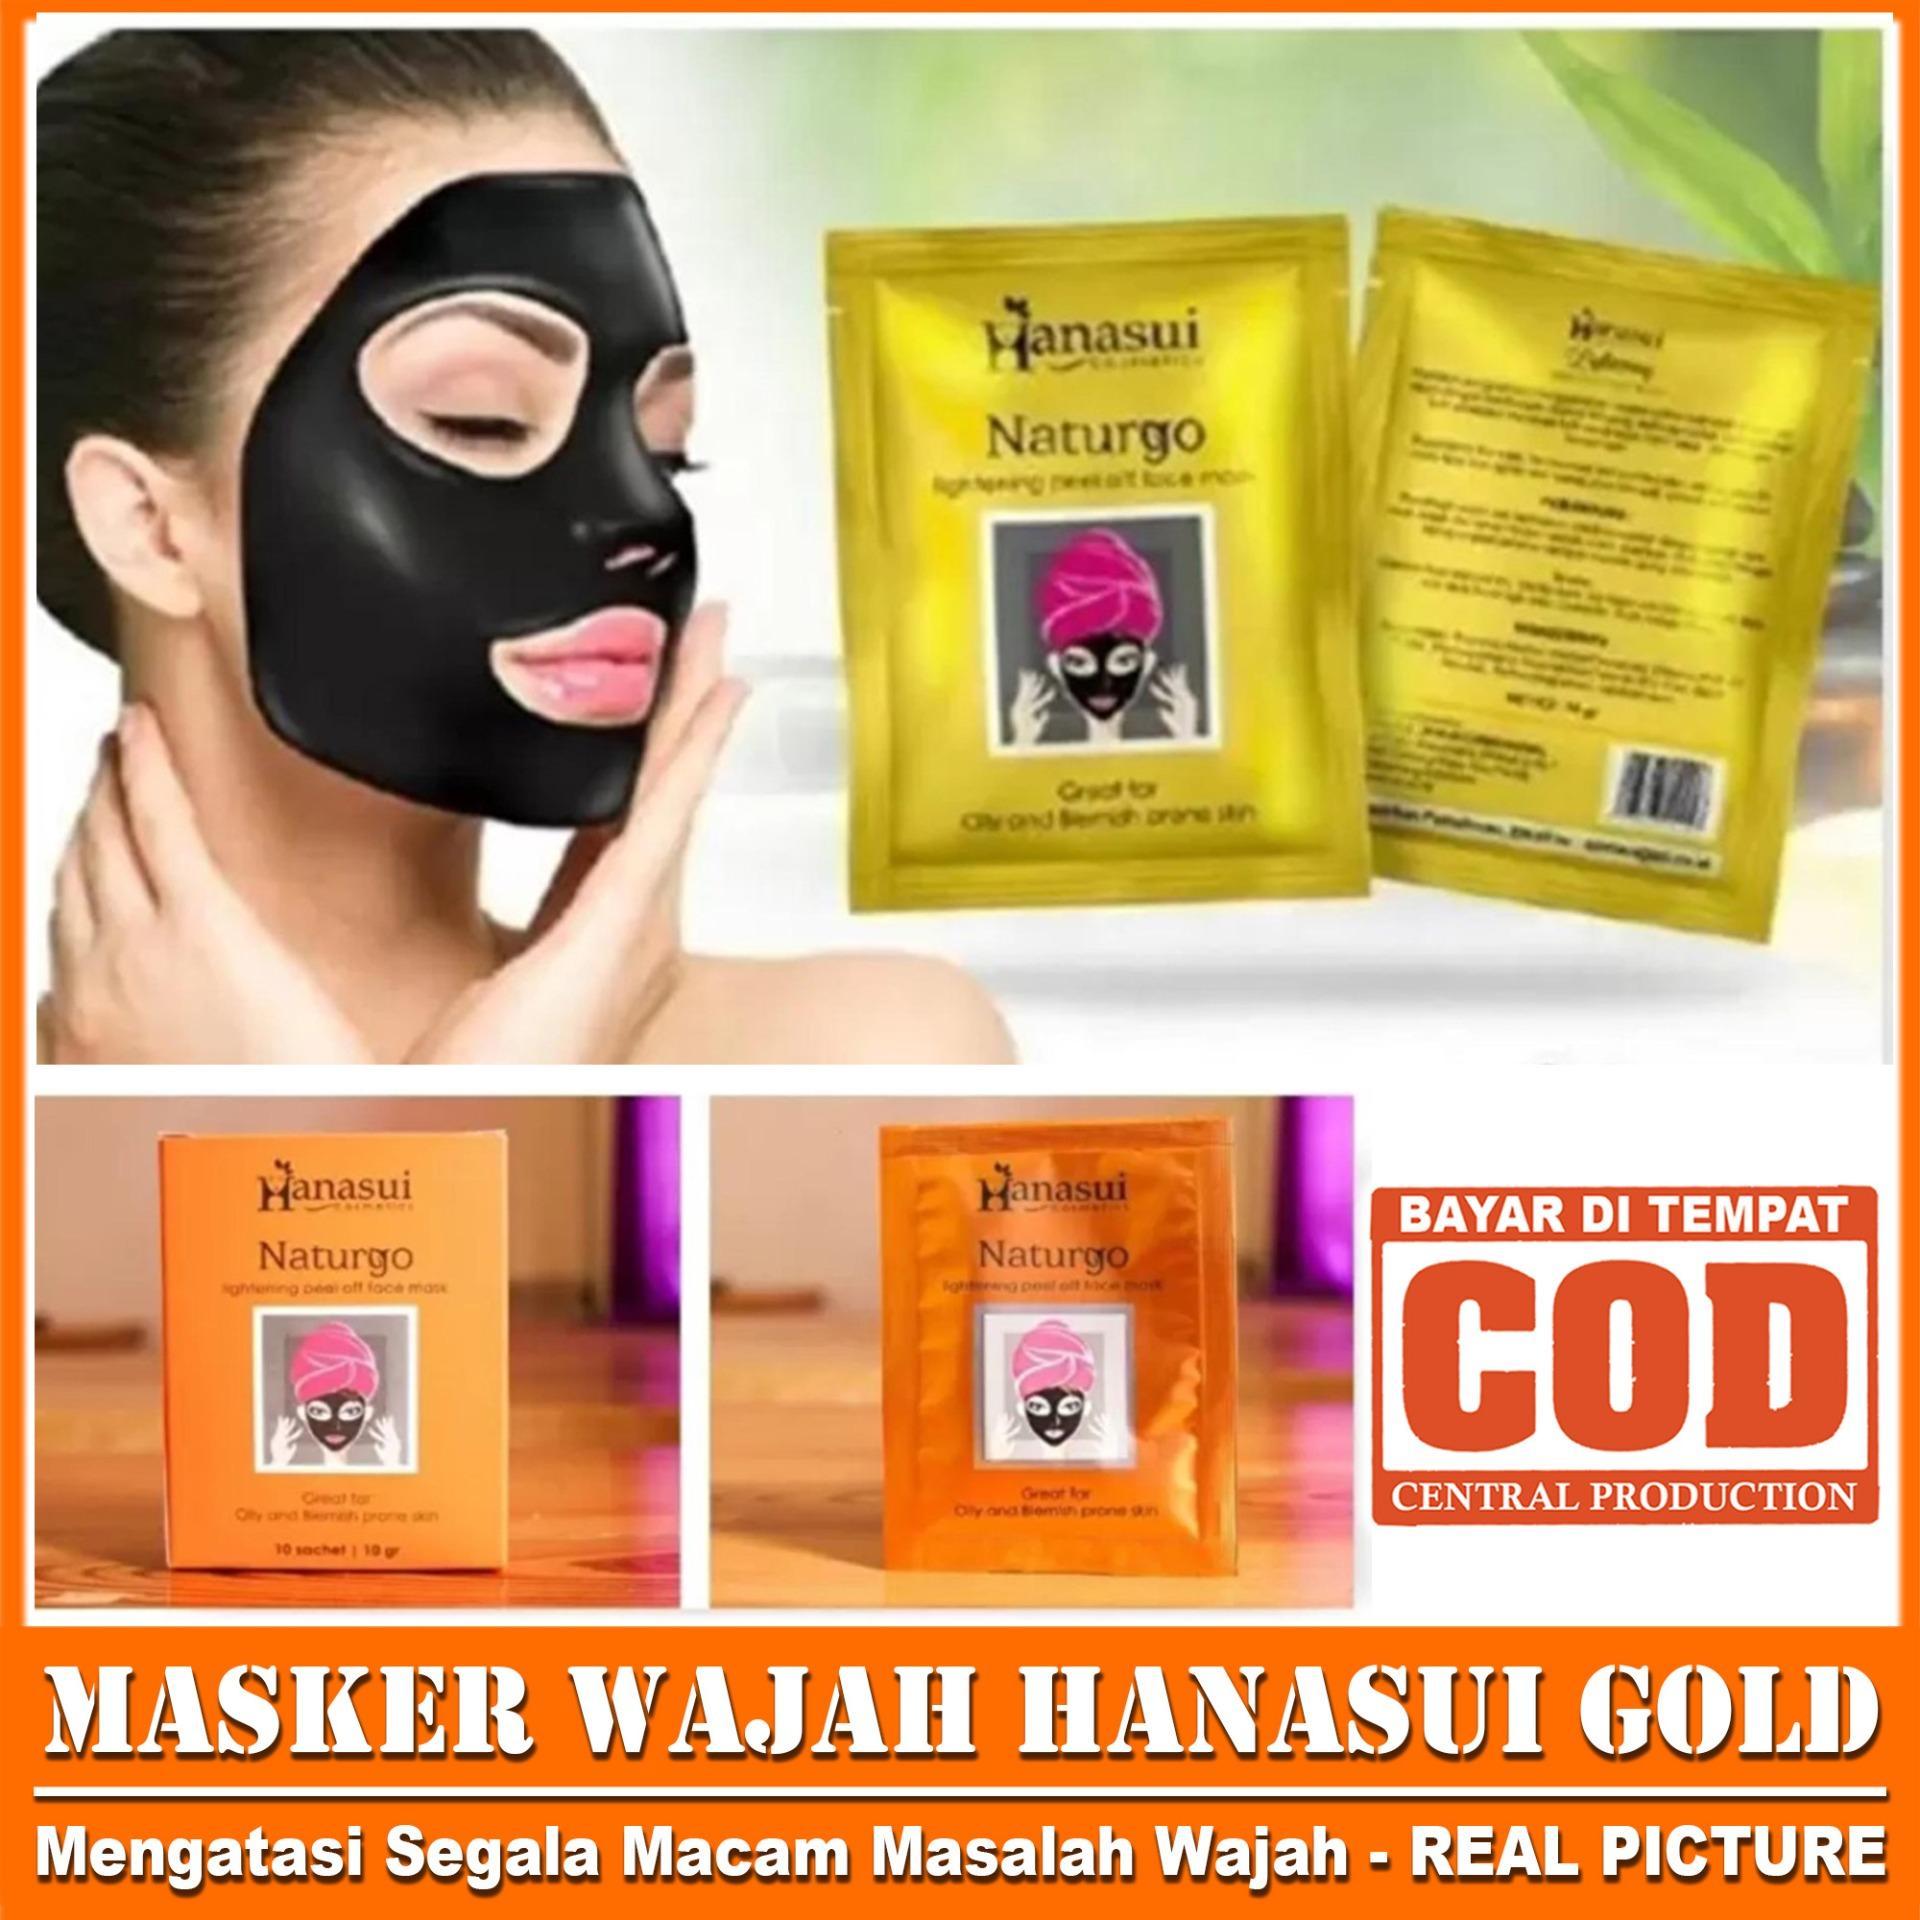 Shiseido Mask Gold Masker Wajah Pengangkat Komedo Isi 20 Sachet Naturgo Emas Shisedo Info Murah Mud 10 Orange Baruada Co Source Hanasui 1